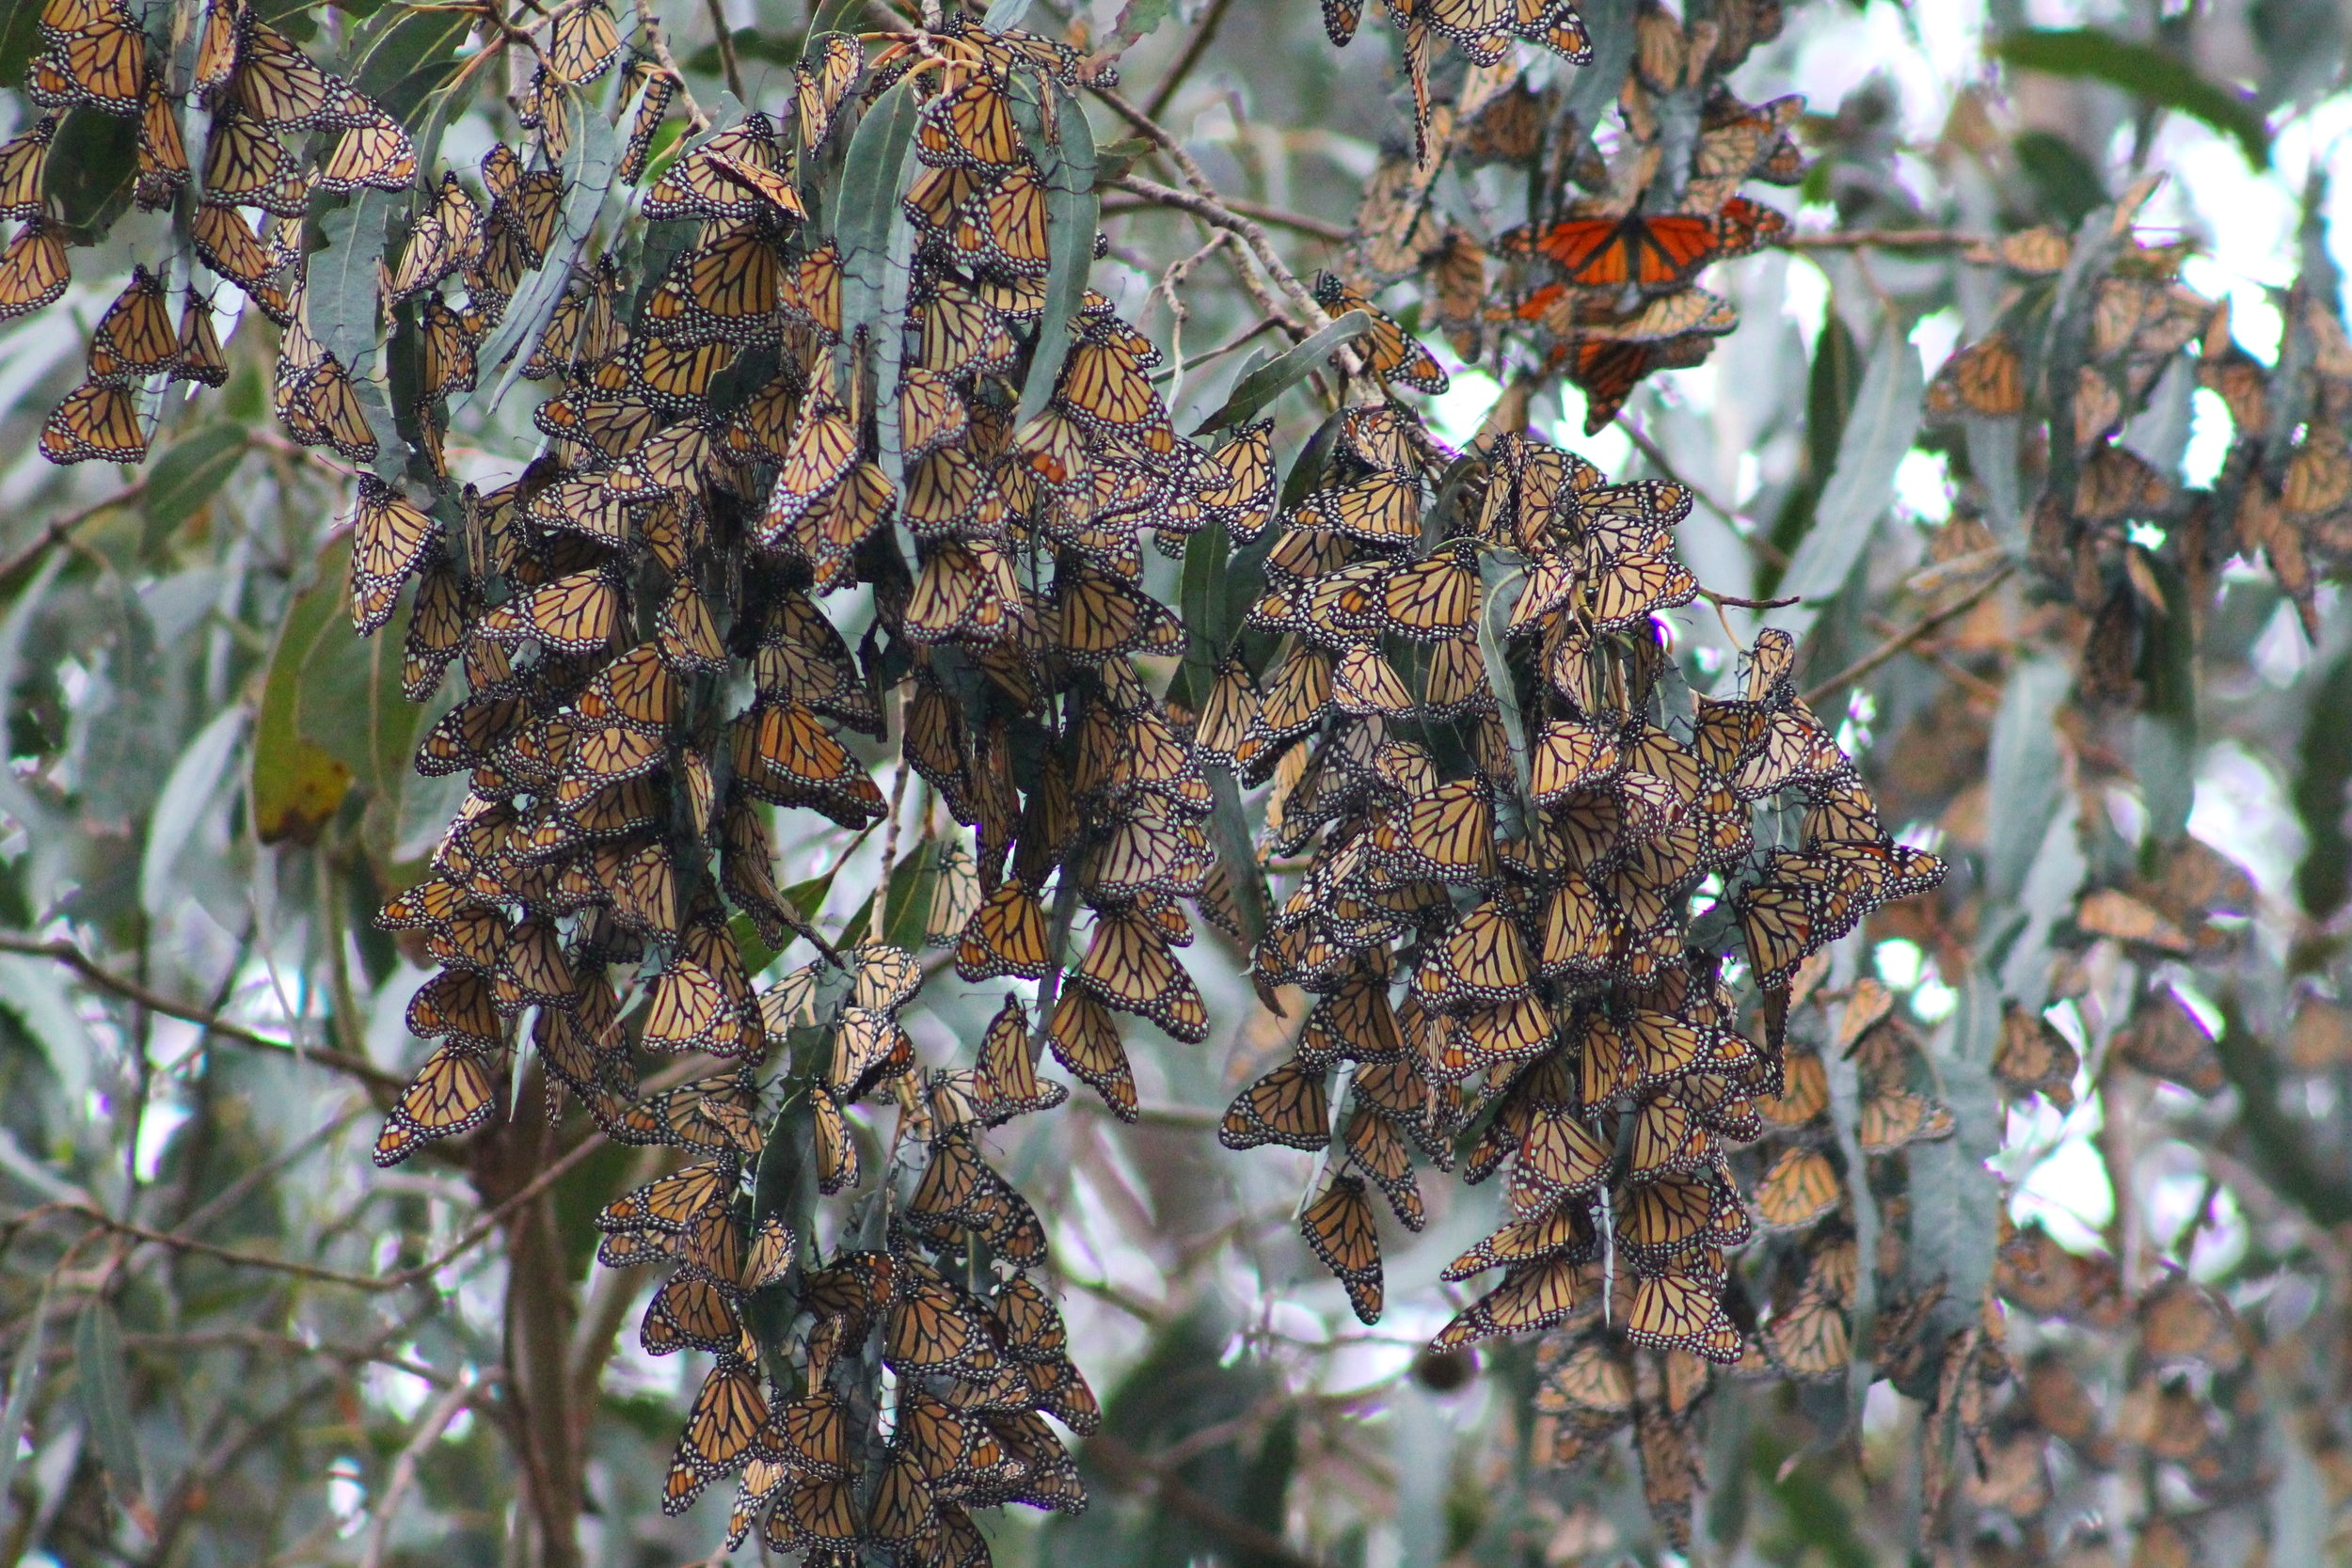 Monarch Butterflies at Pismo Beach, California